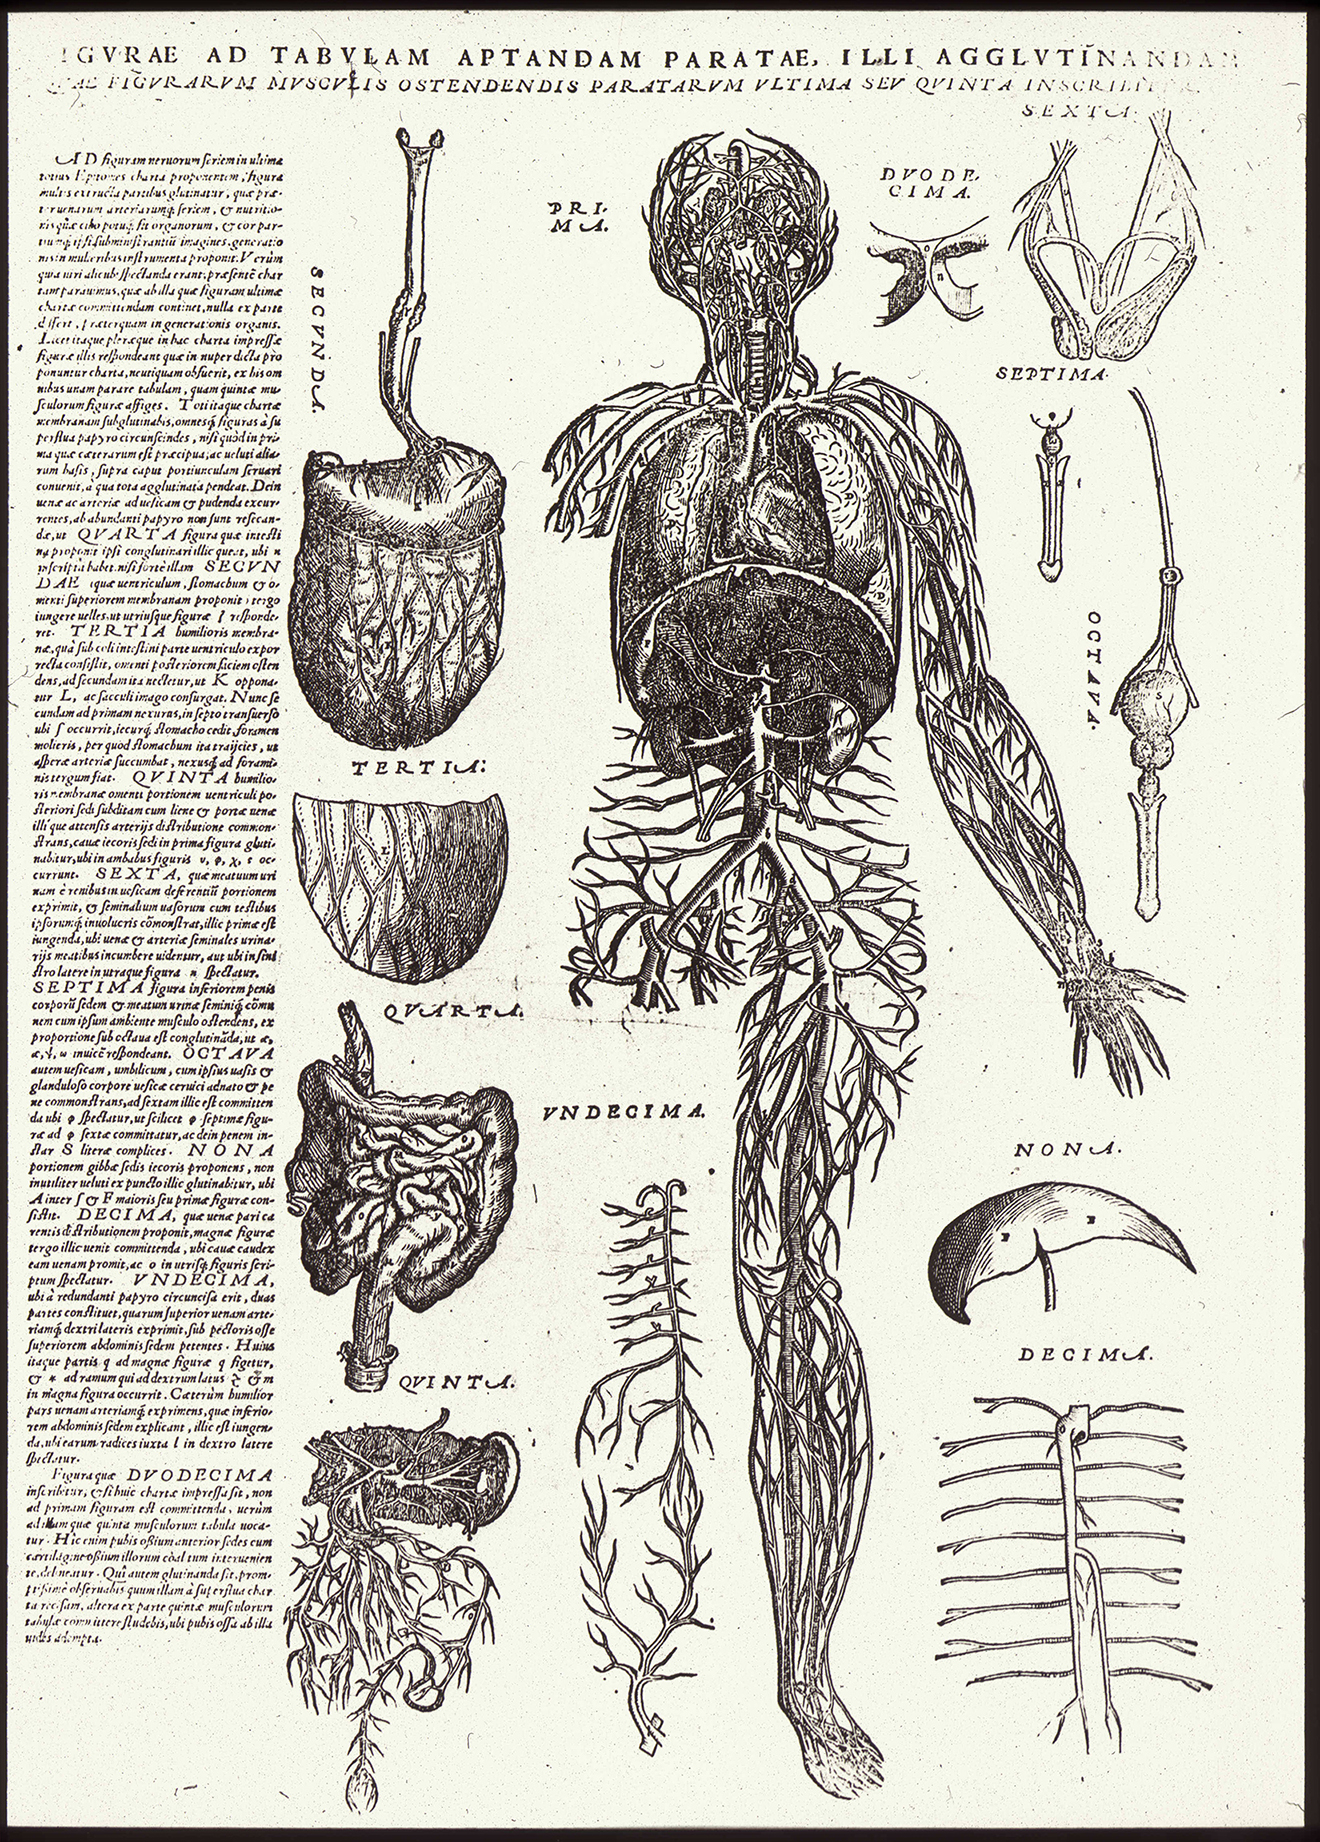 Illustration from Andreas Vesalius, De humani corporis fabrica librorum epitome (1543)